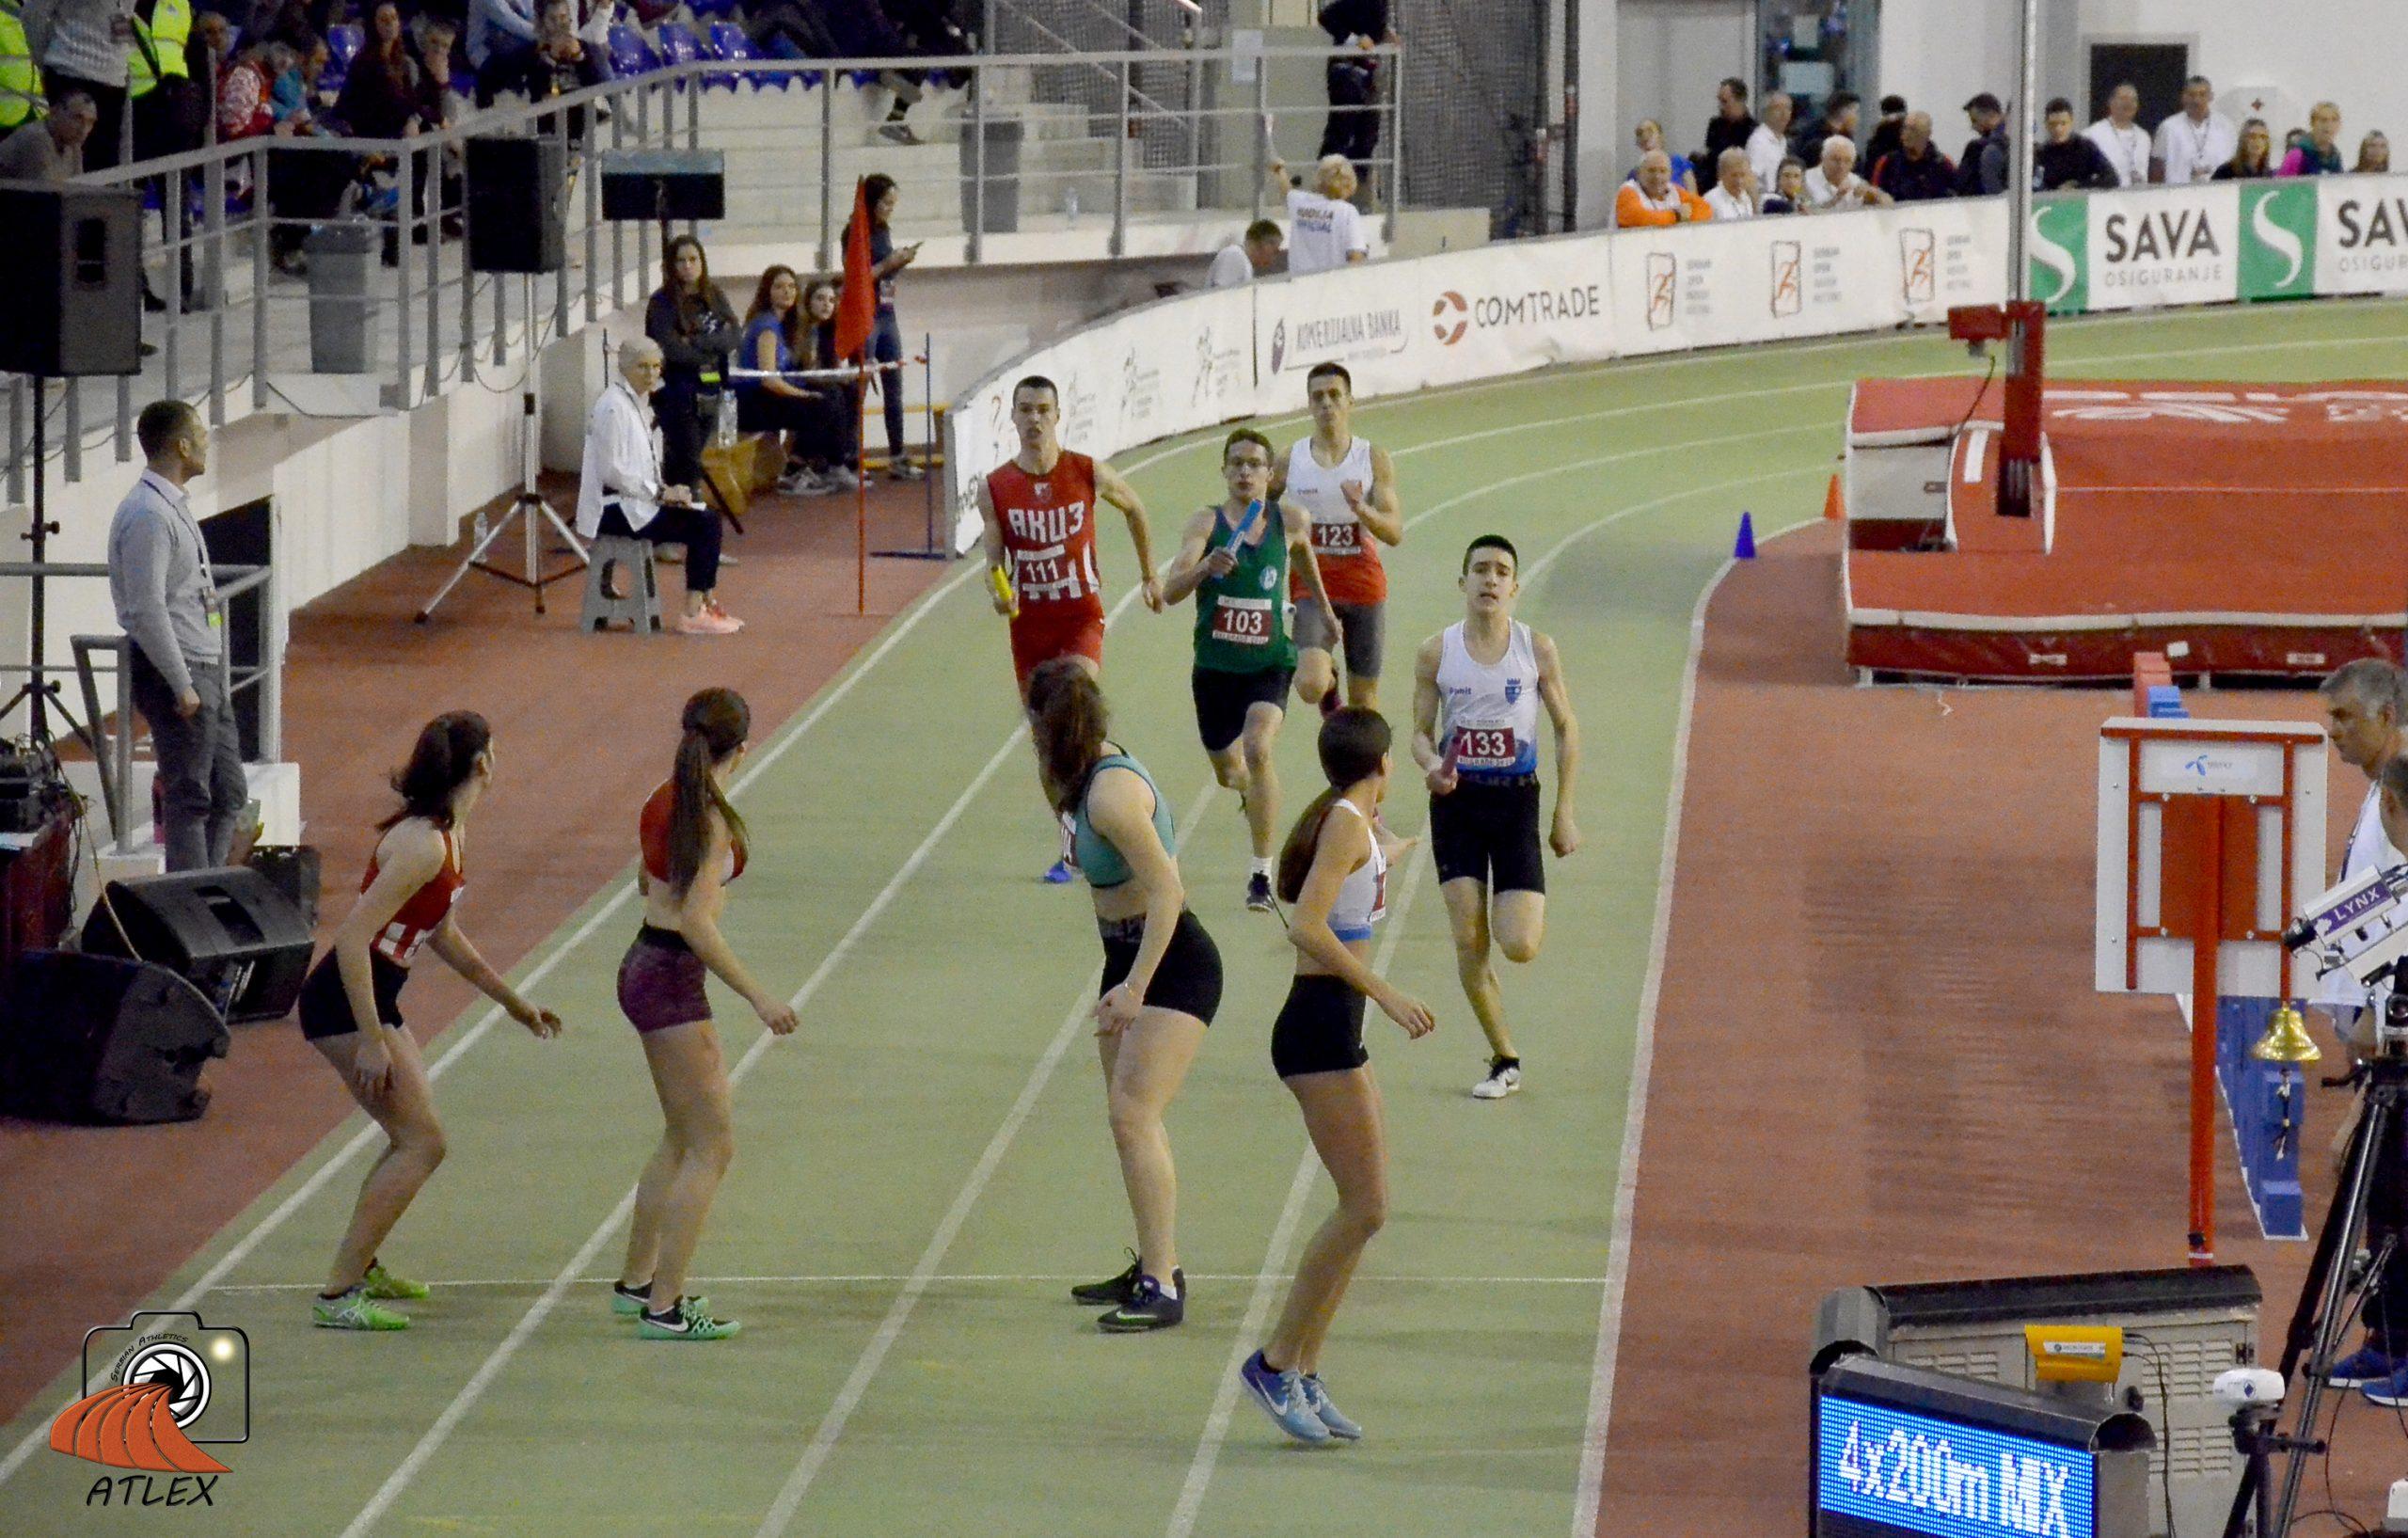 Štafeta 4x200 metara mešovito u18, 5. Serbian Open 2020